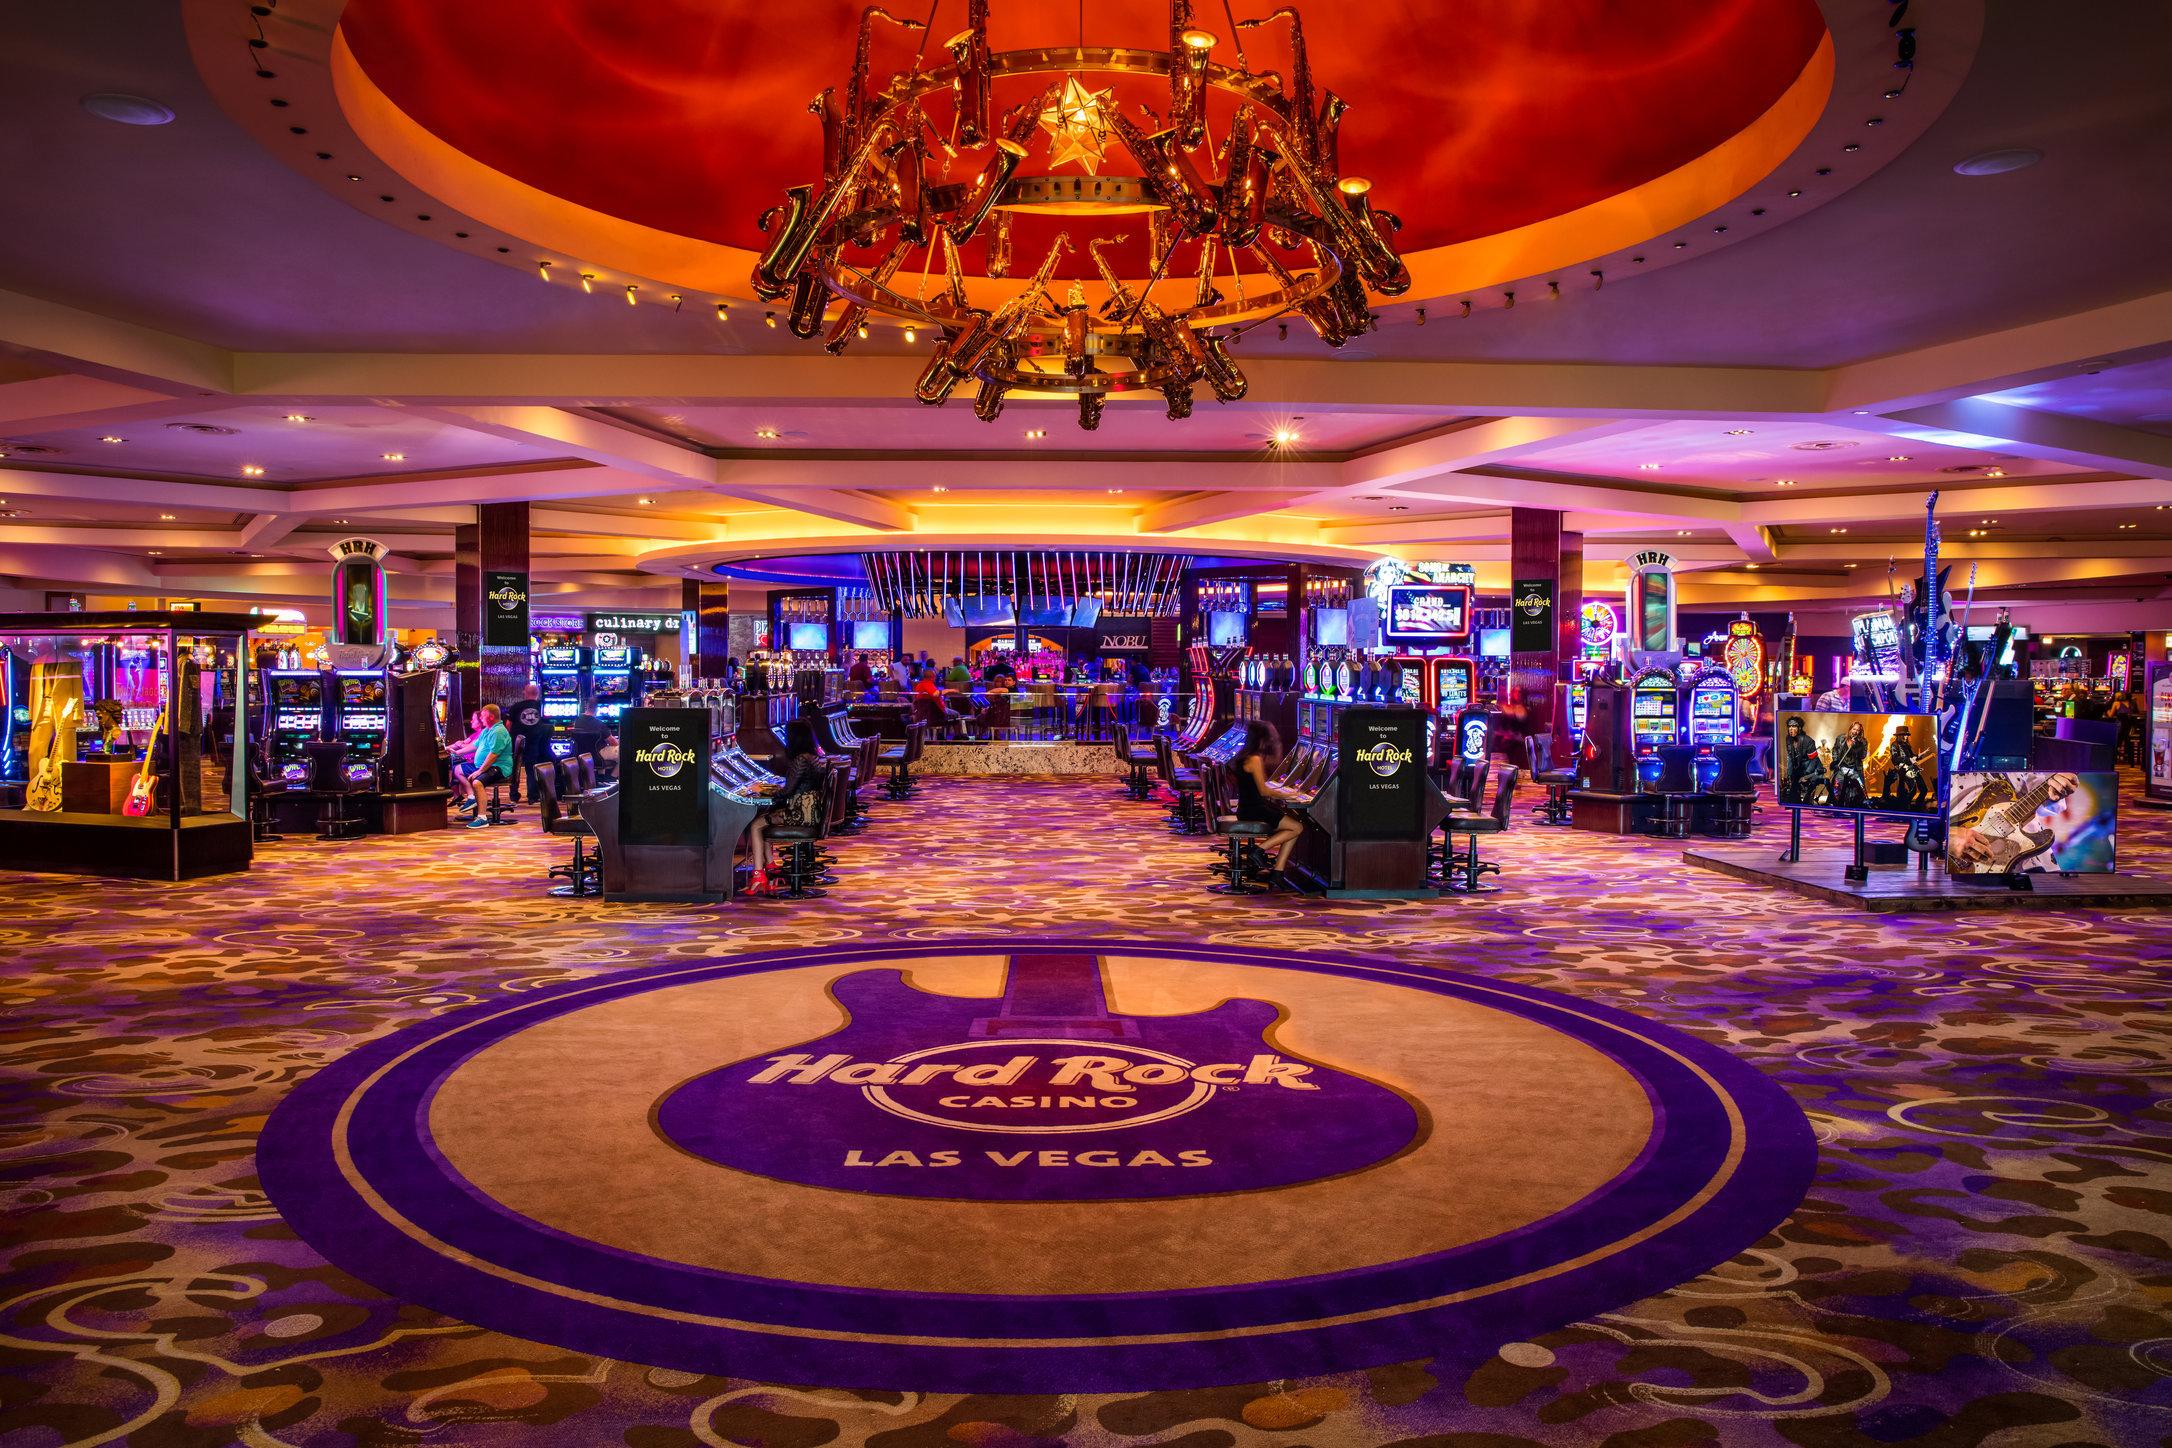 09_21_15_hrh_casino_cent_bar_editorial_kabik-120_LAYERS.jpg